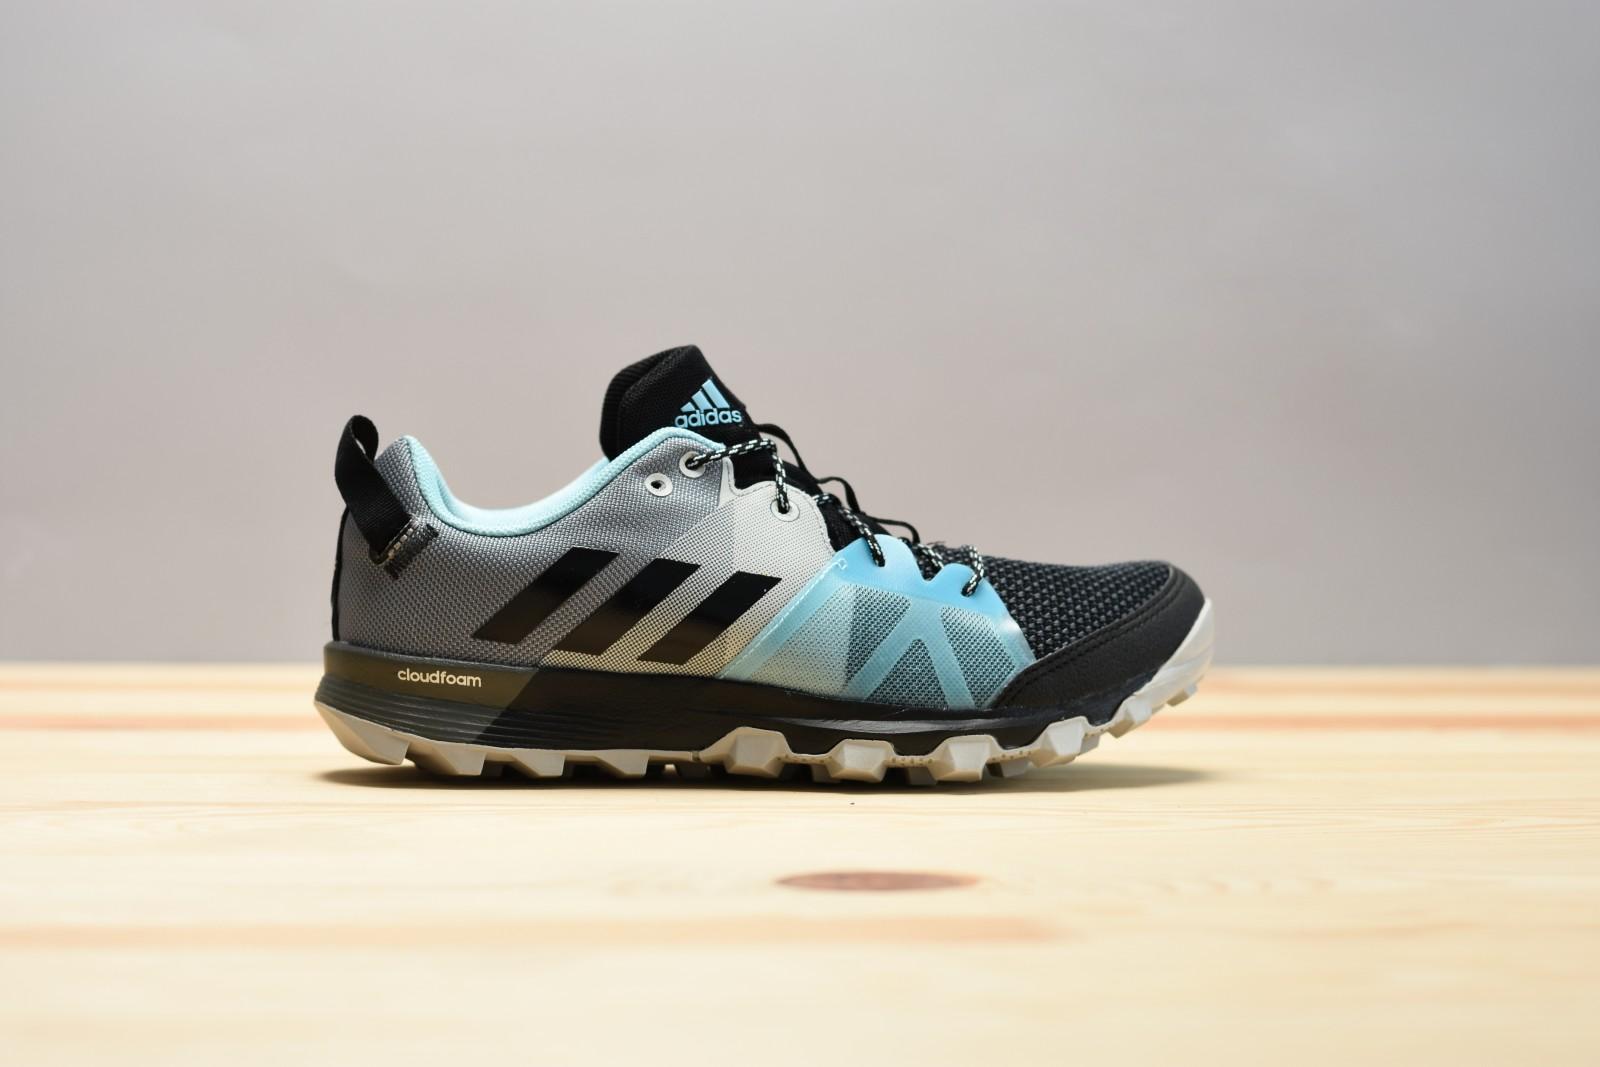 4ae073b5248 Dámské Běžecké boty adidas Performance kanadia 8.1 tr w